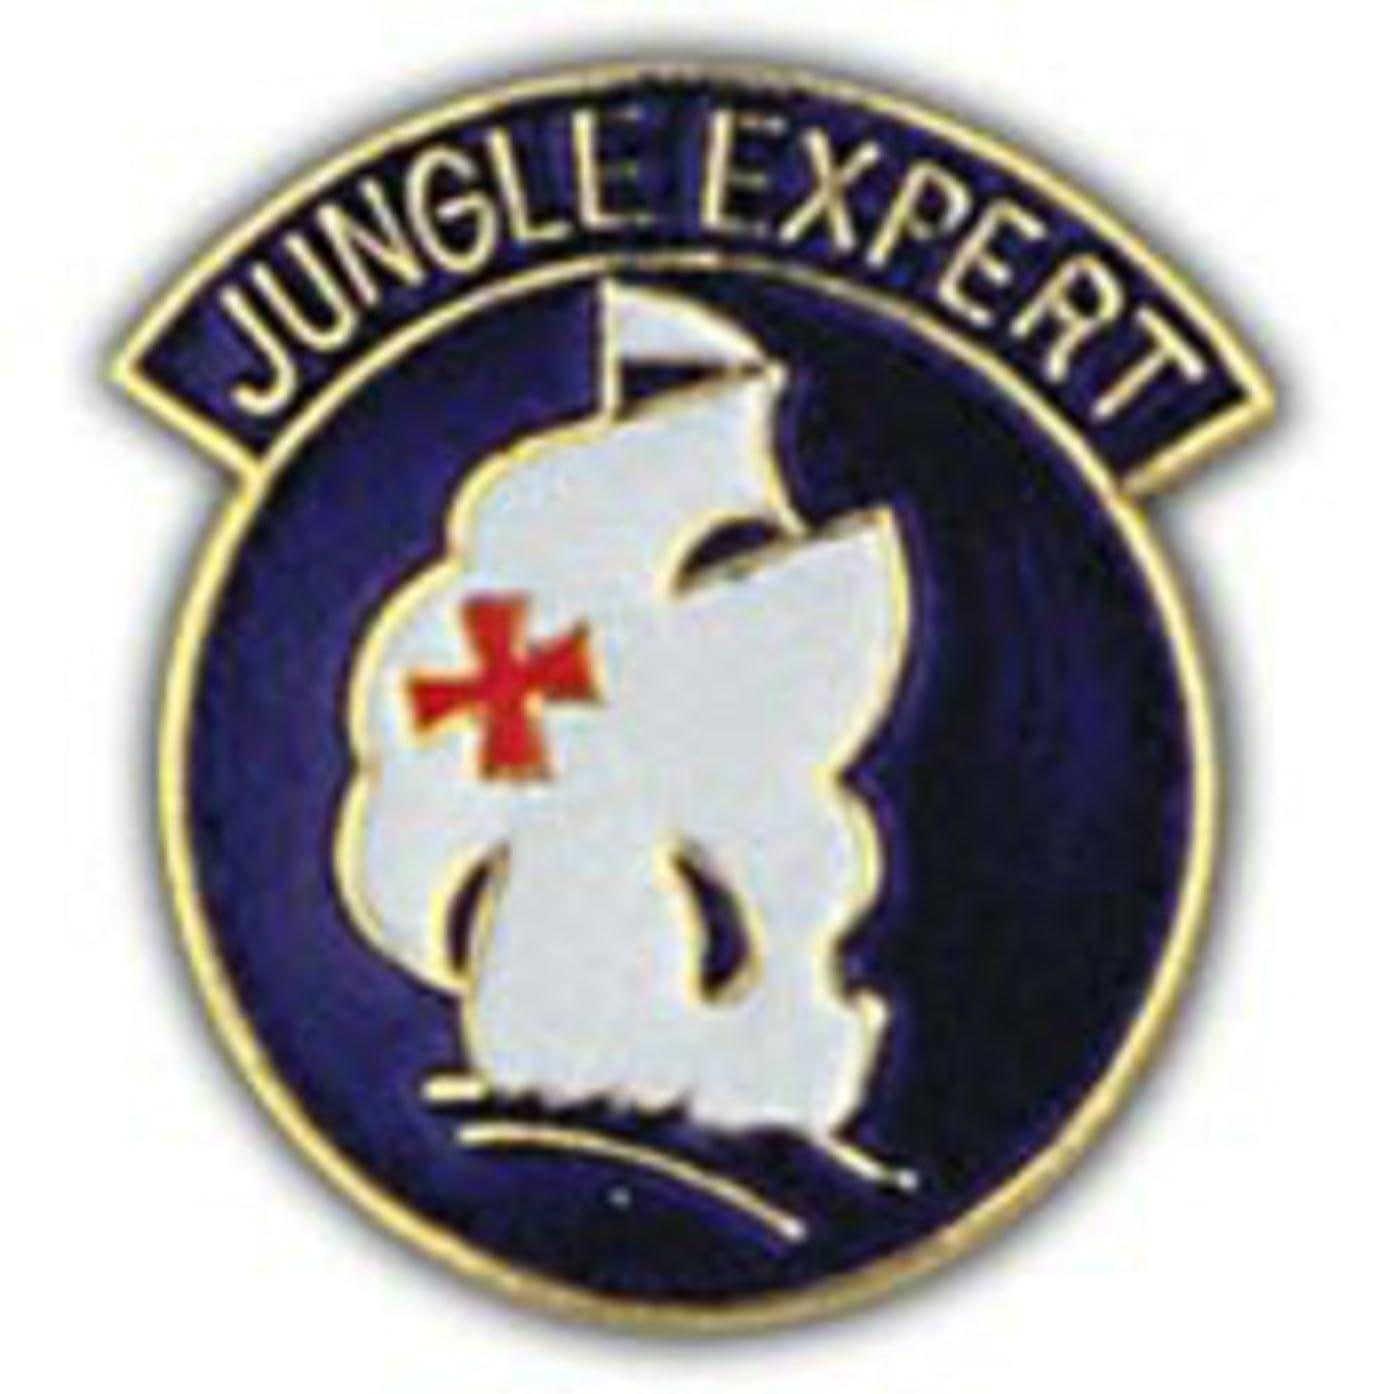 EagleEmblems P14943 Pin-Army,Jungle Expert (1'')